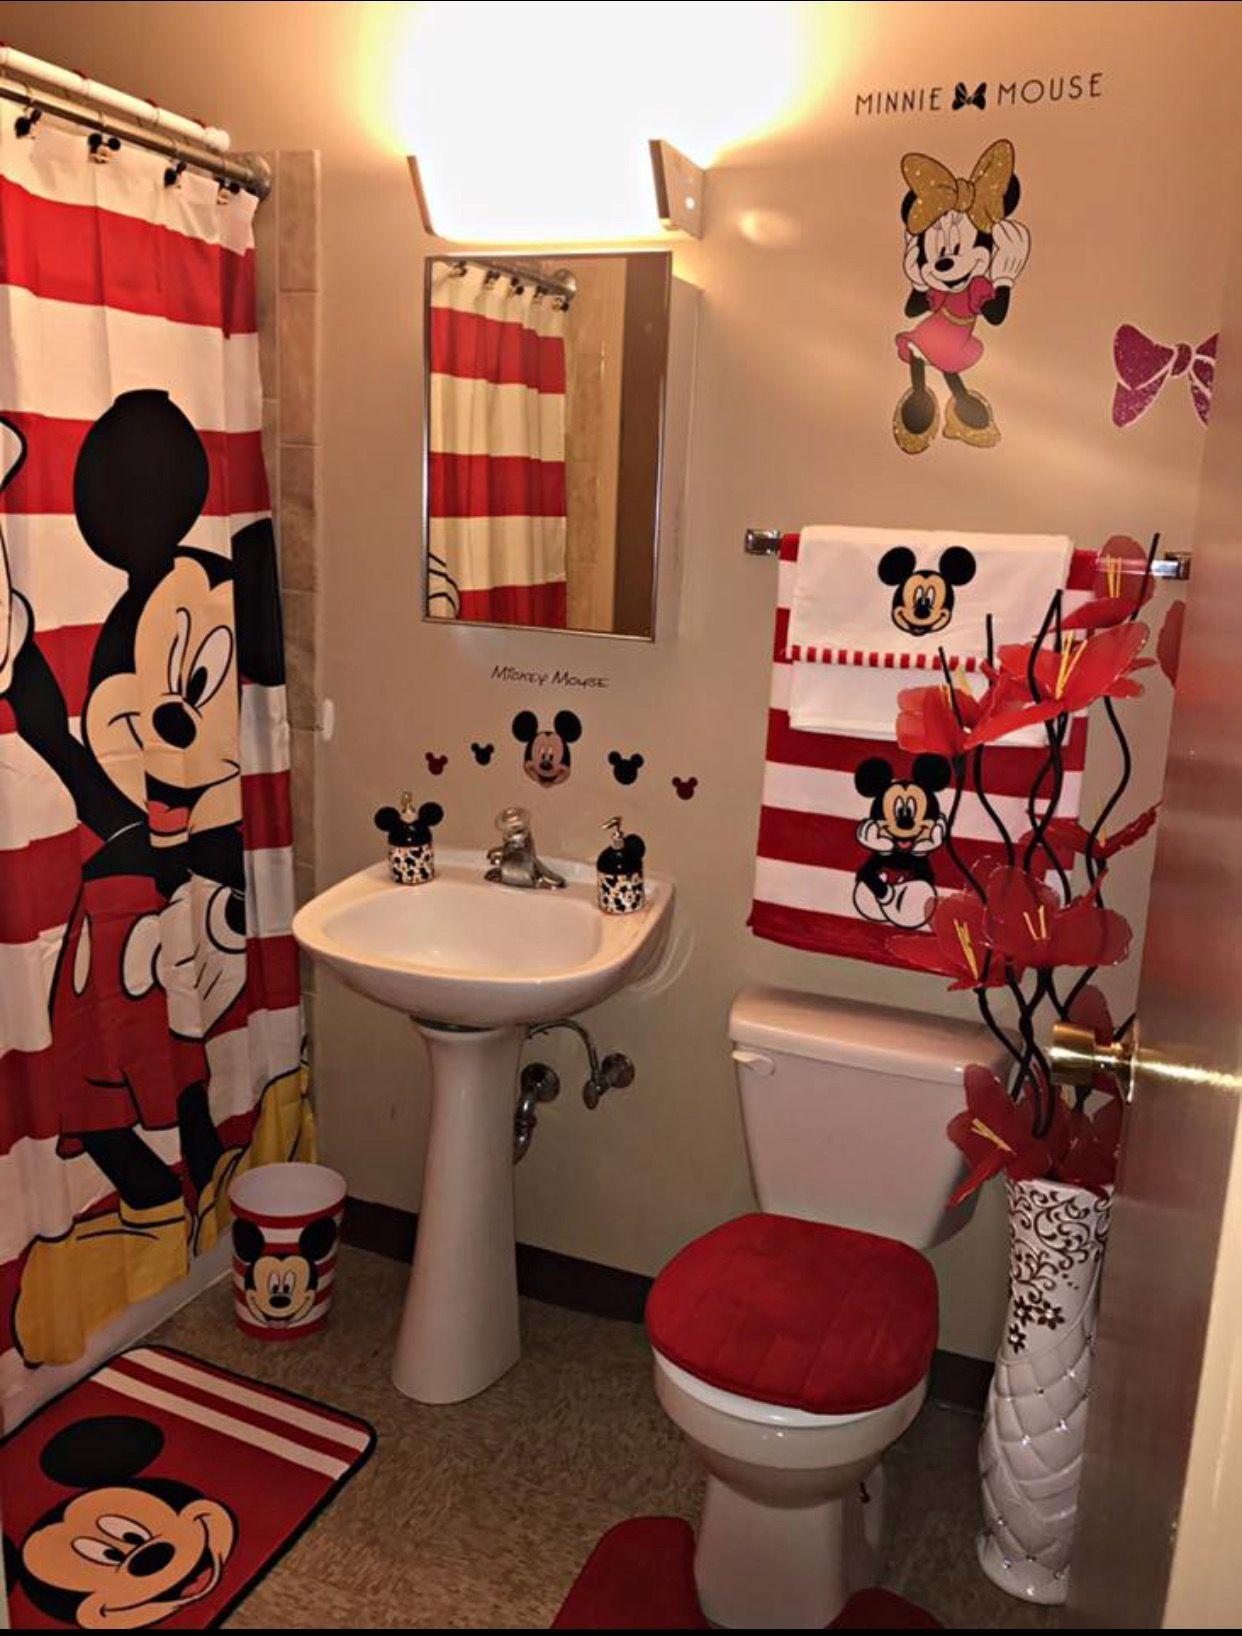 Mickey Bathroom Decor in 2020 | Disney bathroom, Mickey mouse